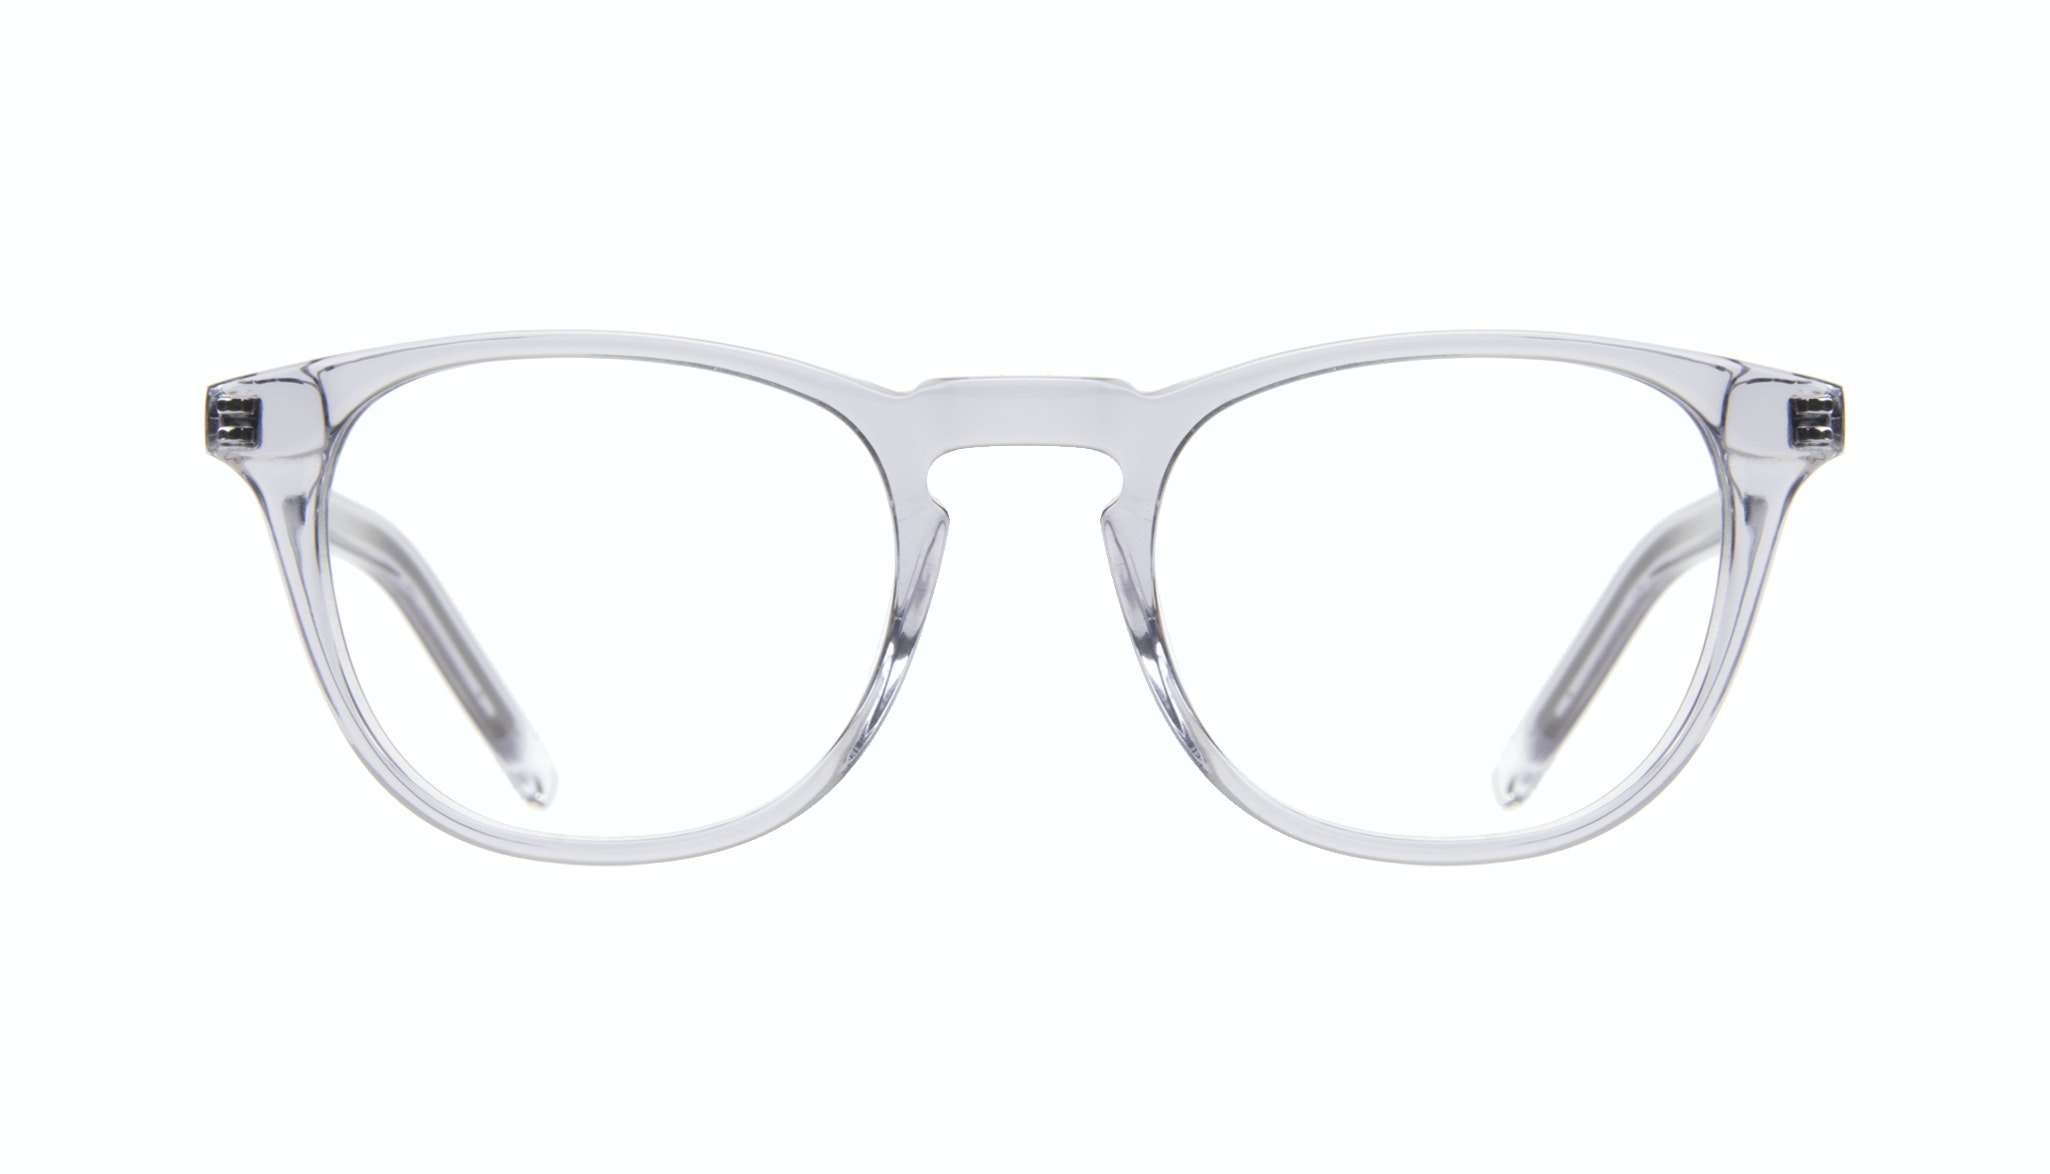 Affordable Fashion Glasses Rectangle Square Eyeglasses Men Sturdy Steel